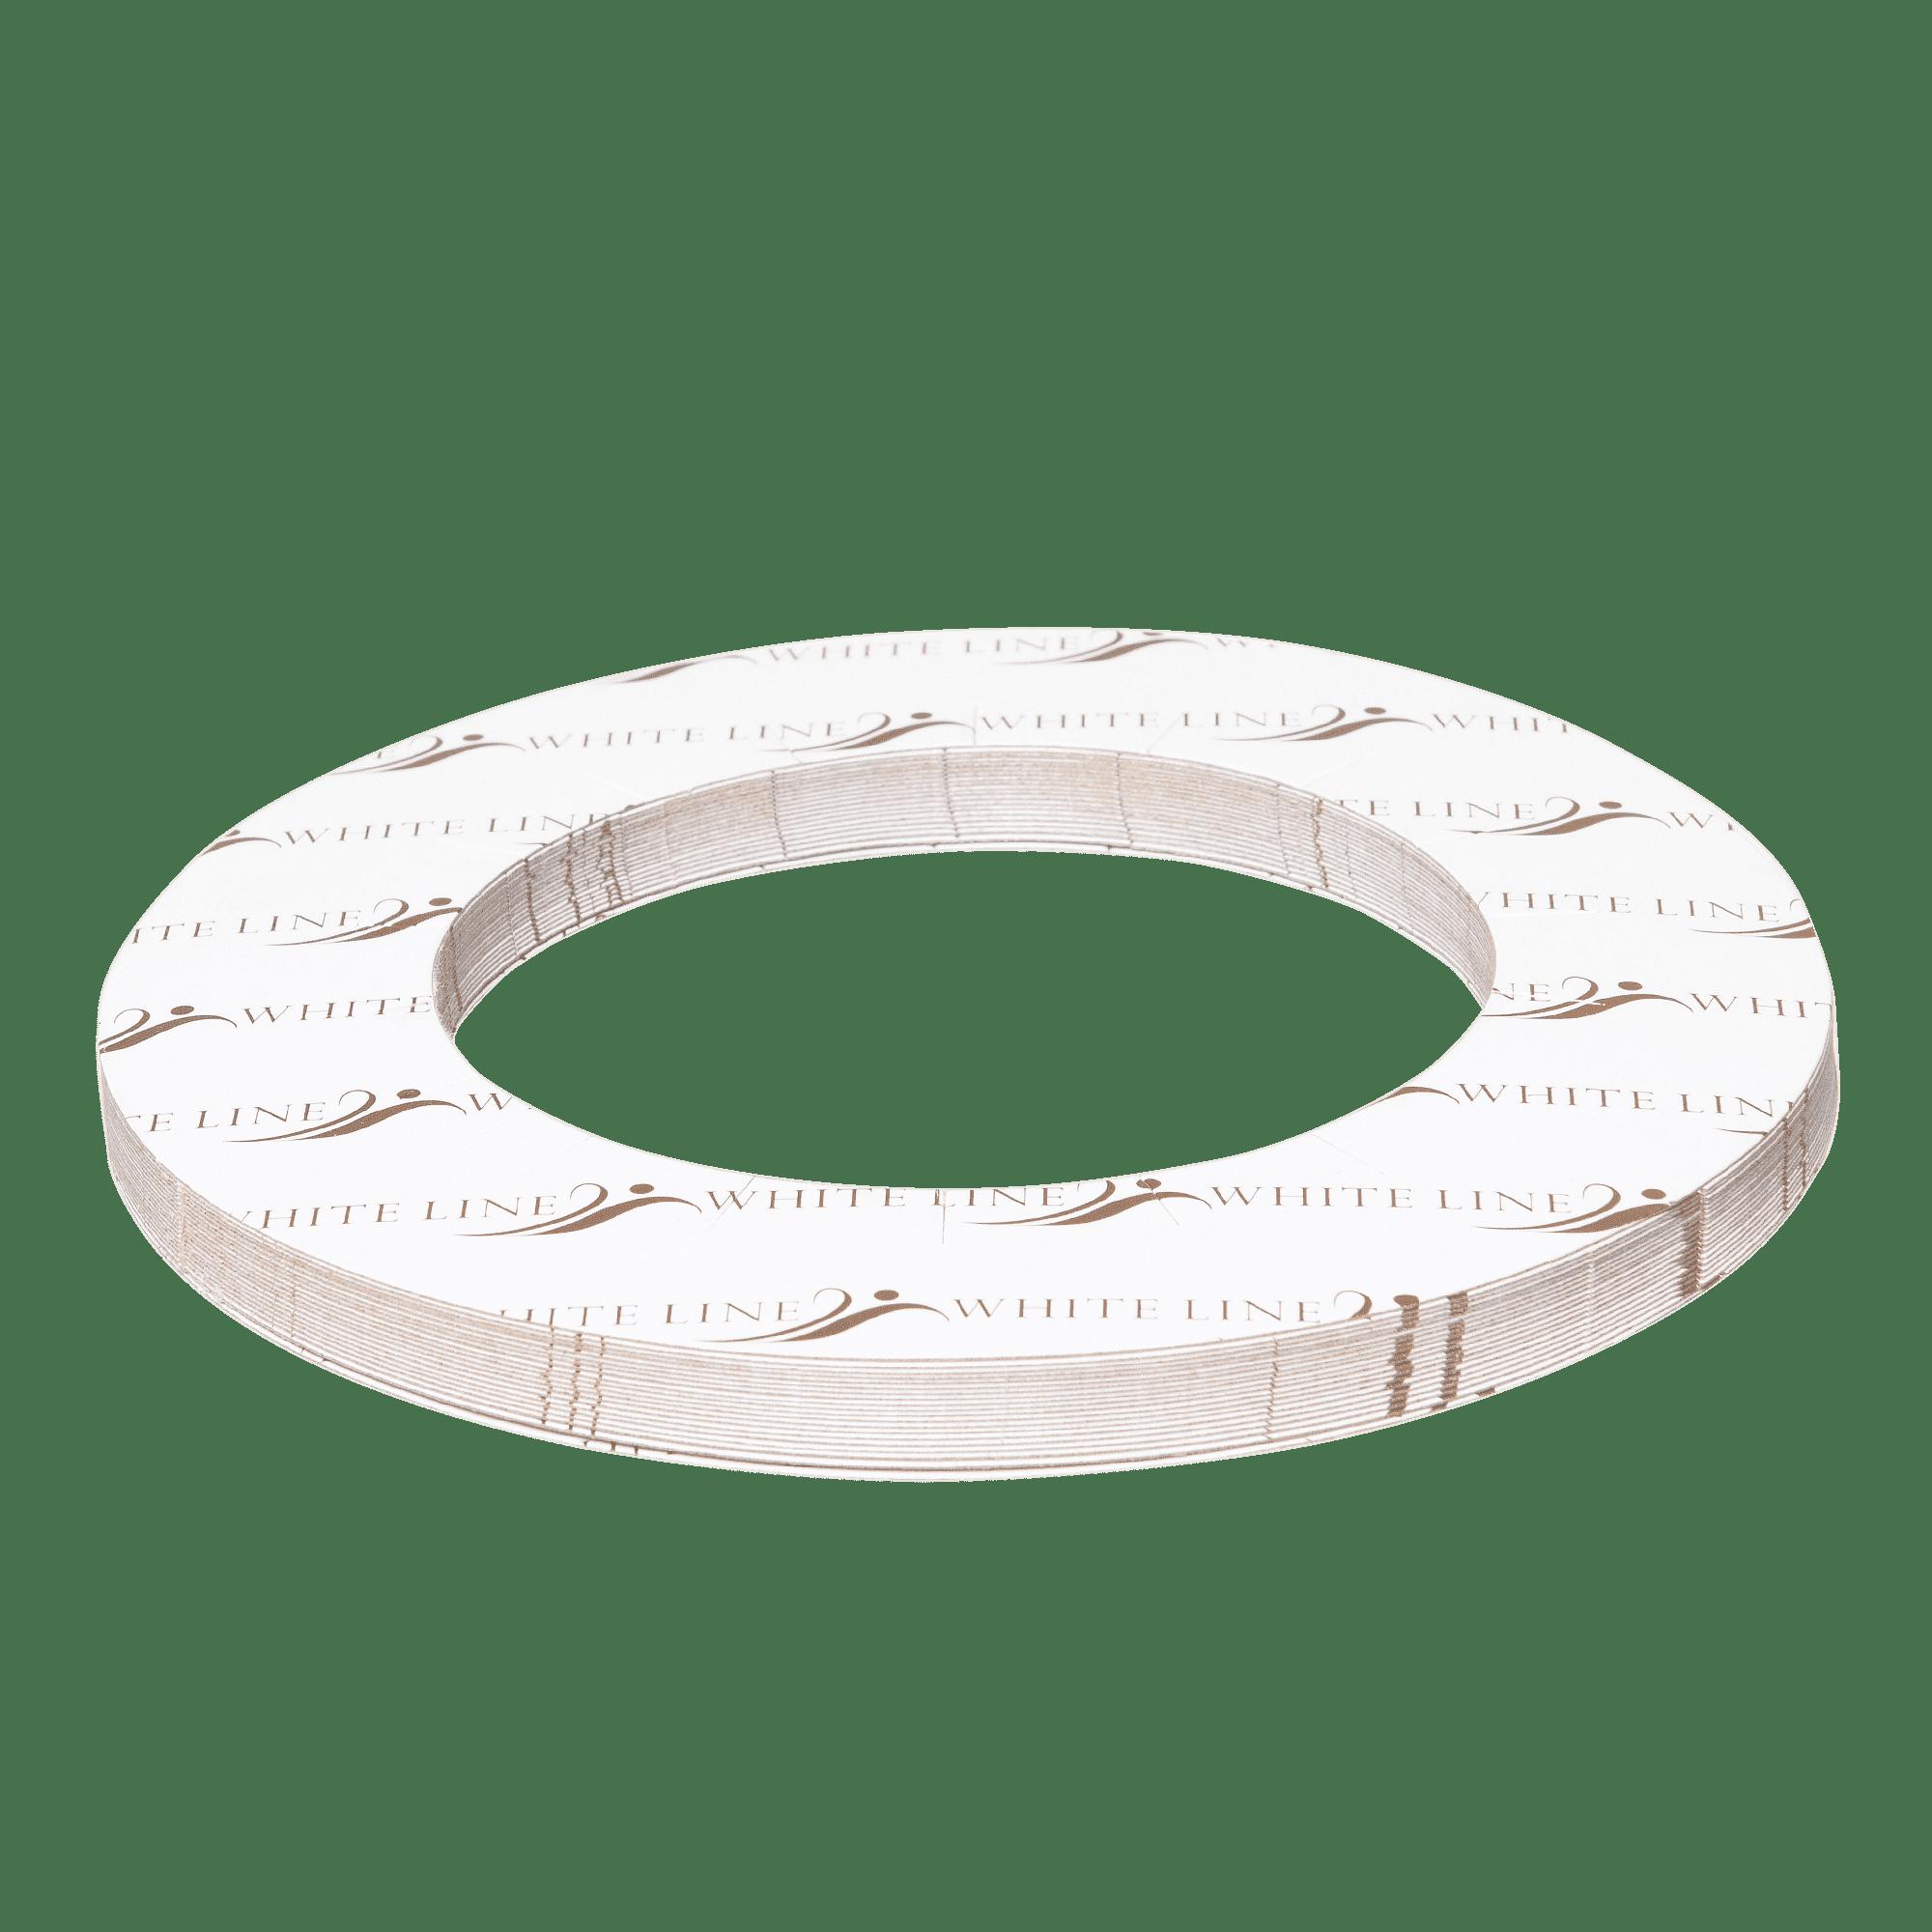 Sweet Epil, Защитное бумажное кольцо для нагревателя White Line, 20 шт/уп